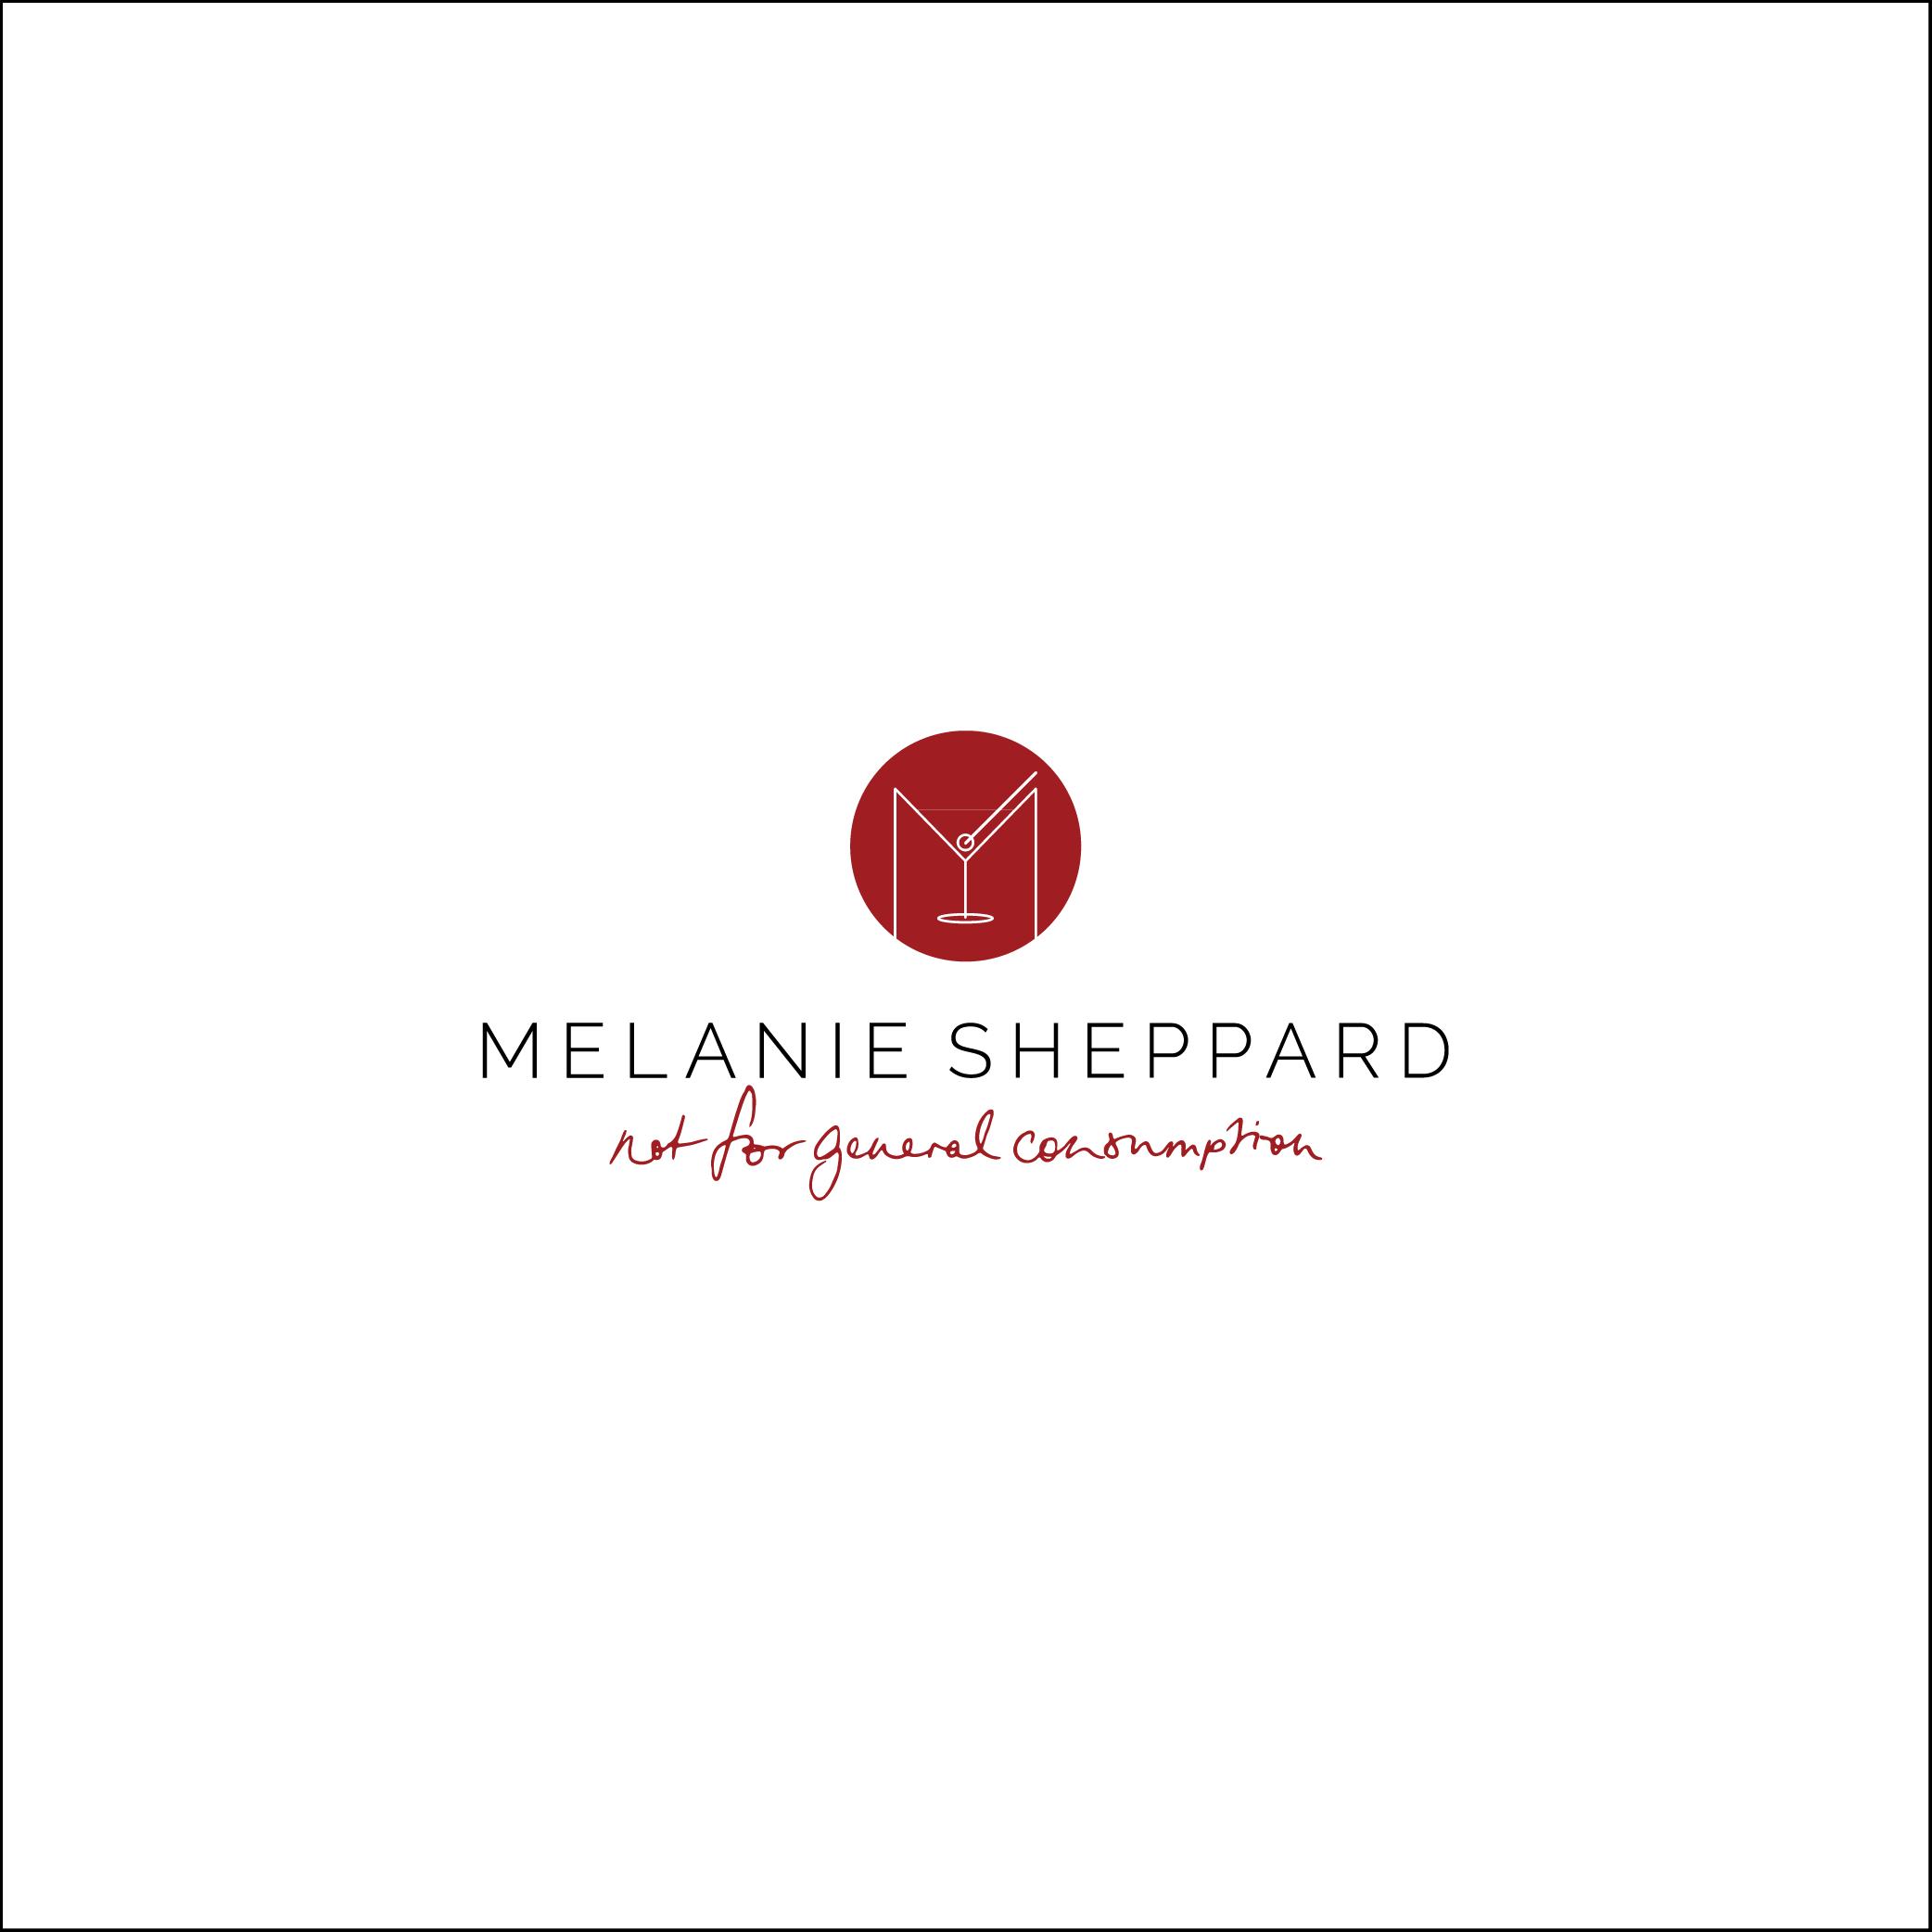 personal brand blog logos_bigger stroke_Melanie Sheppard.png